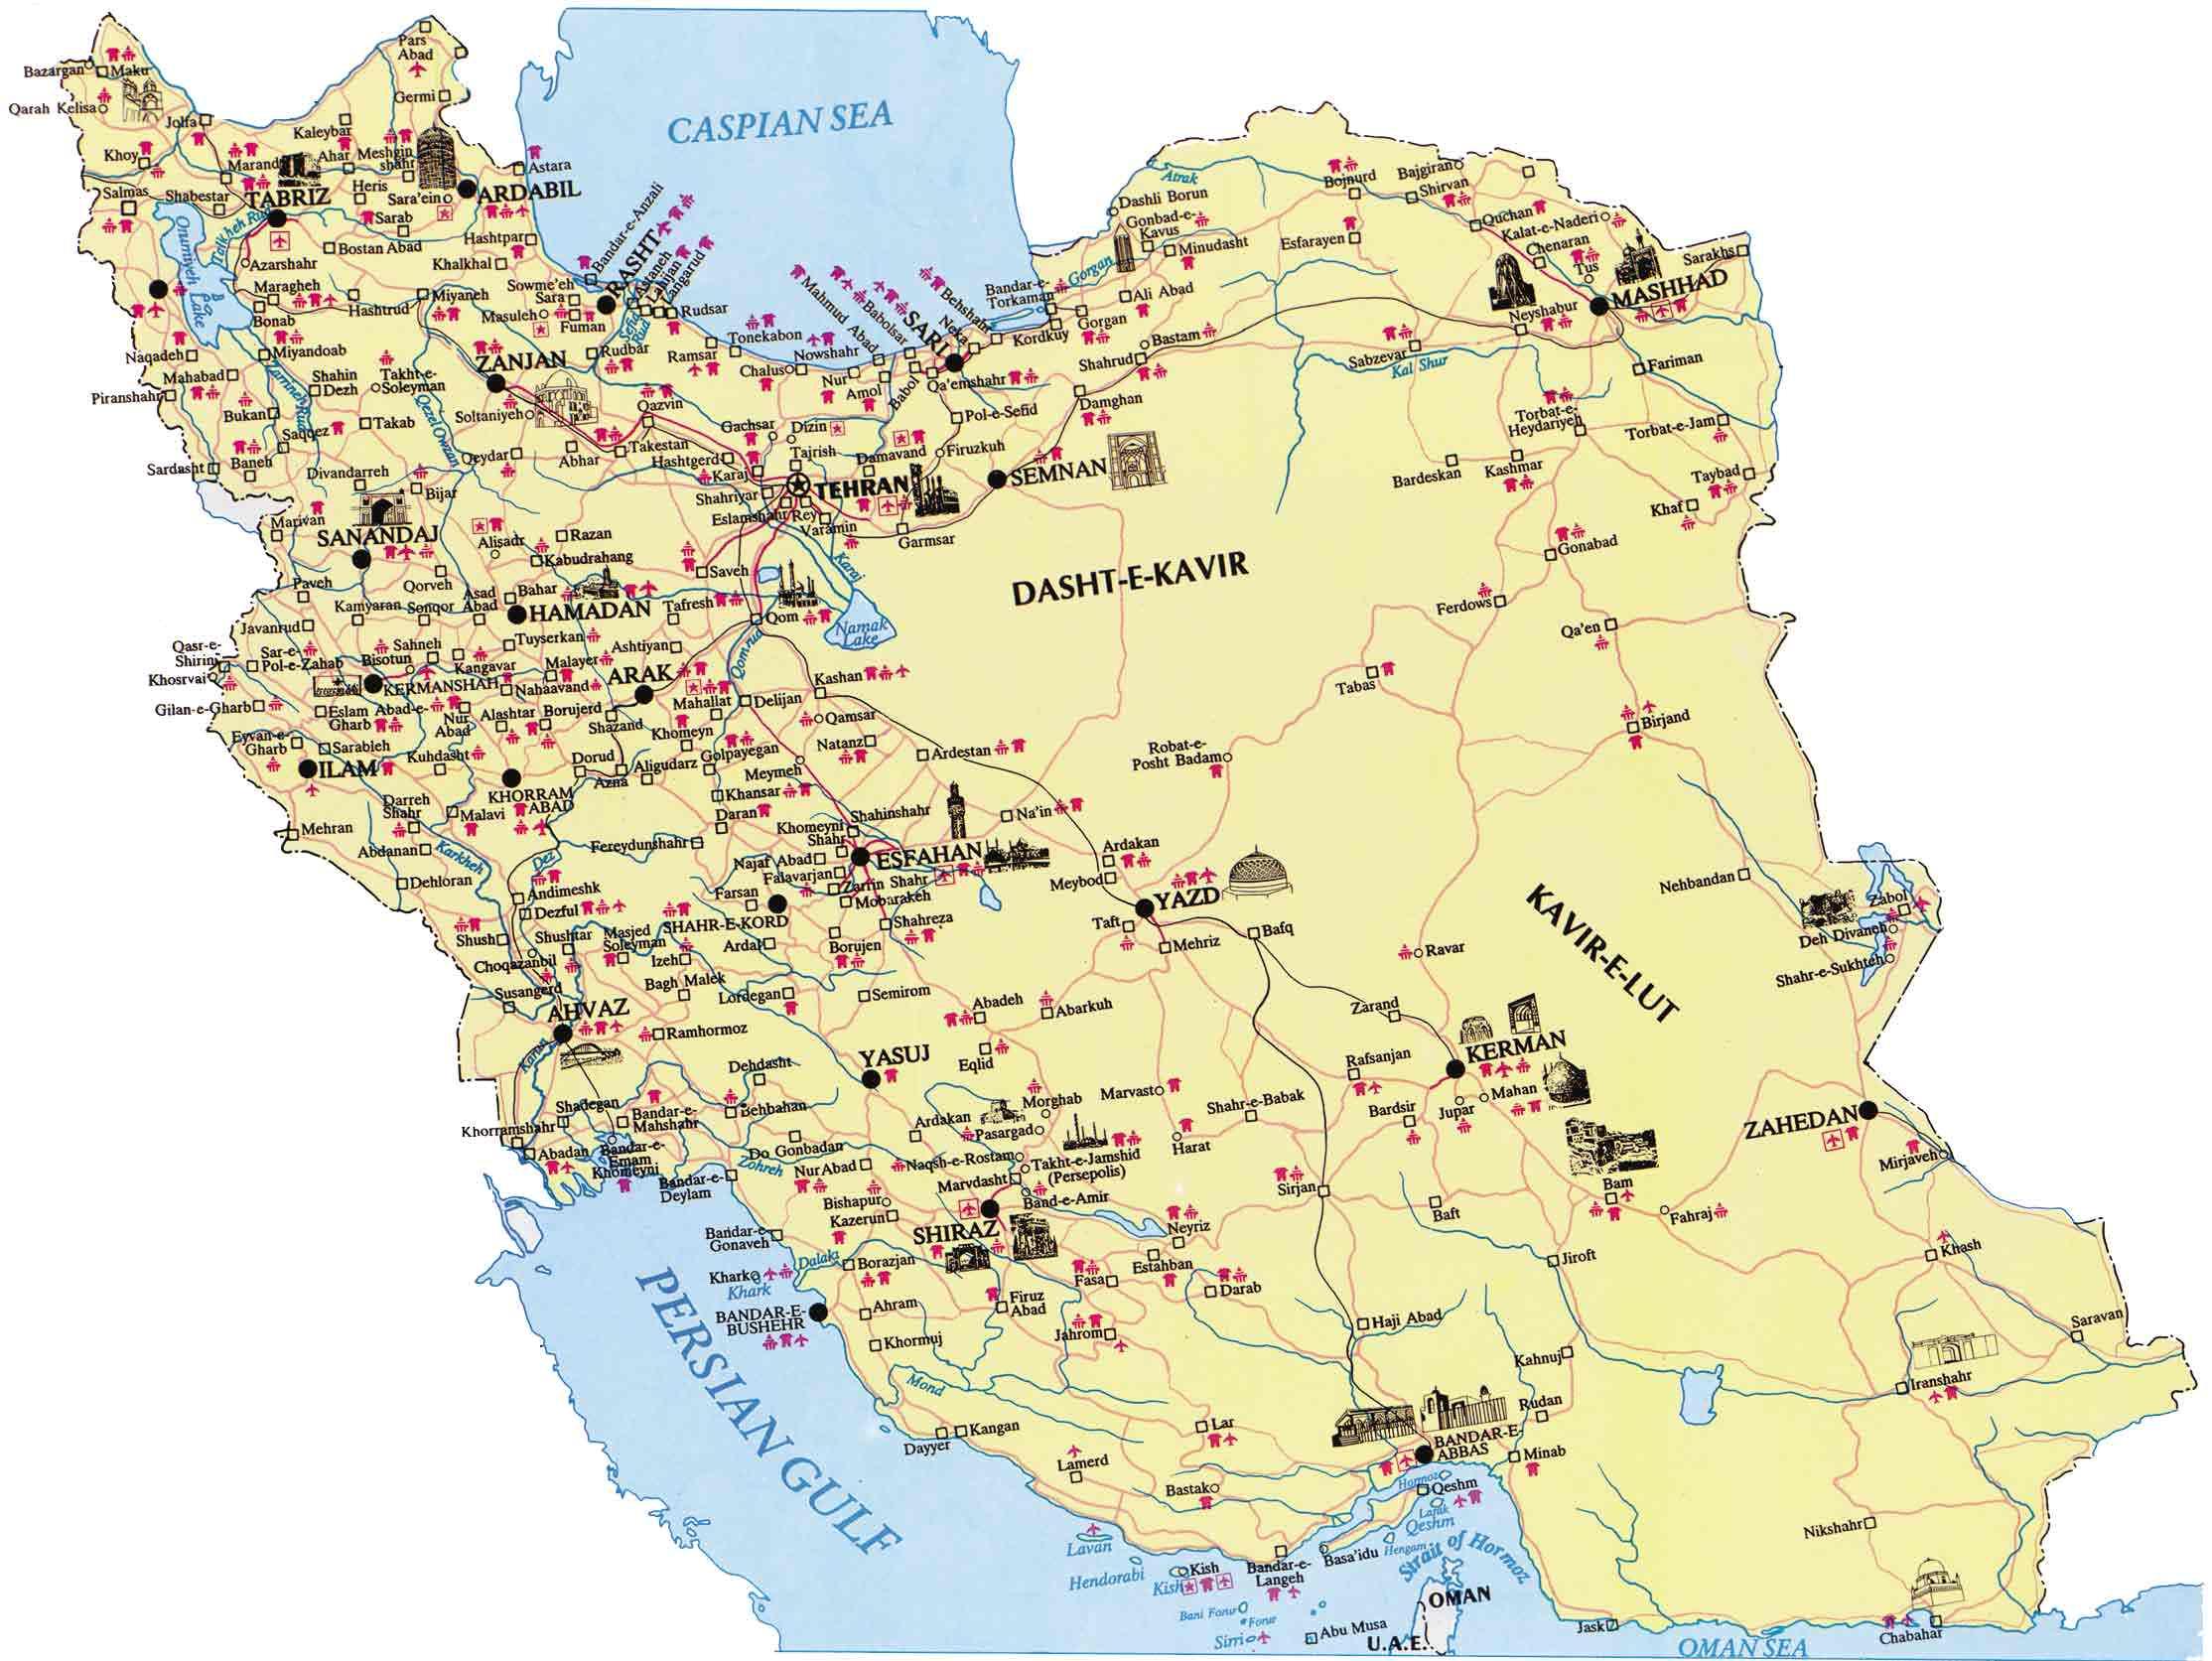 Иран на карте мира на русском языке